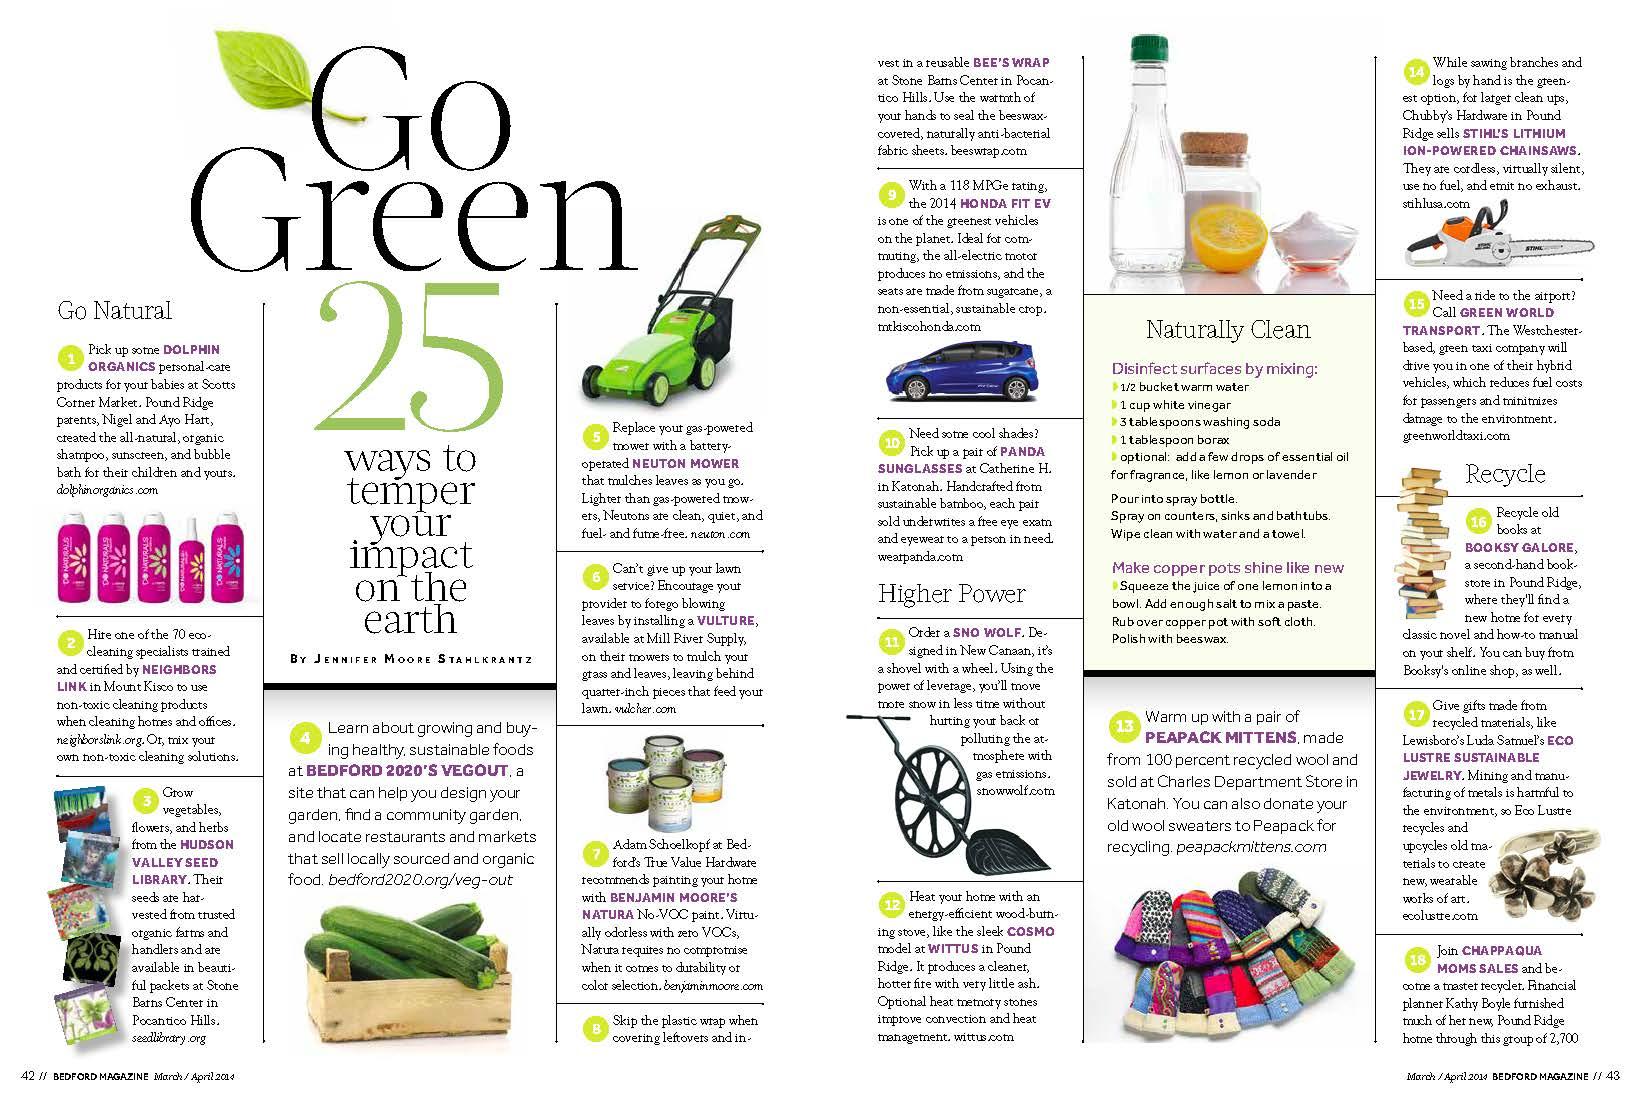 bedford magazine featured